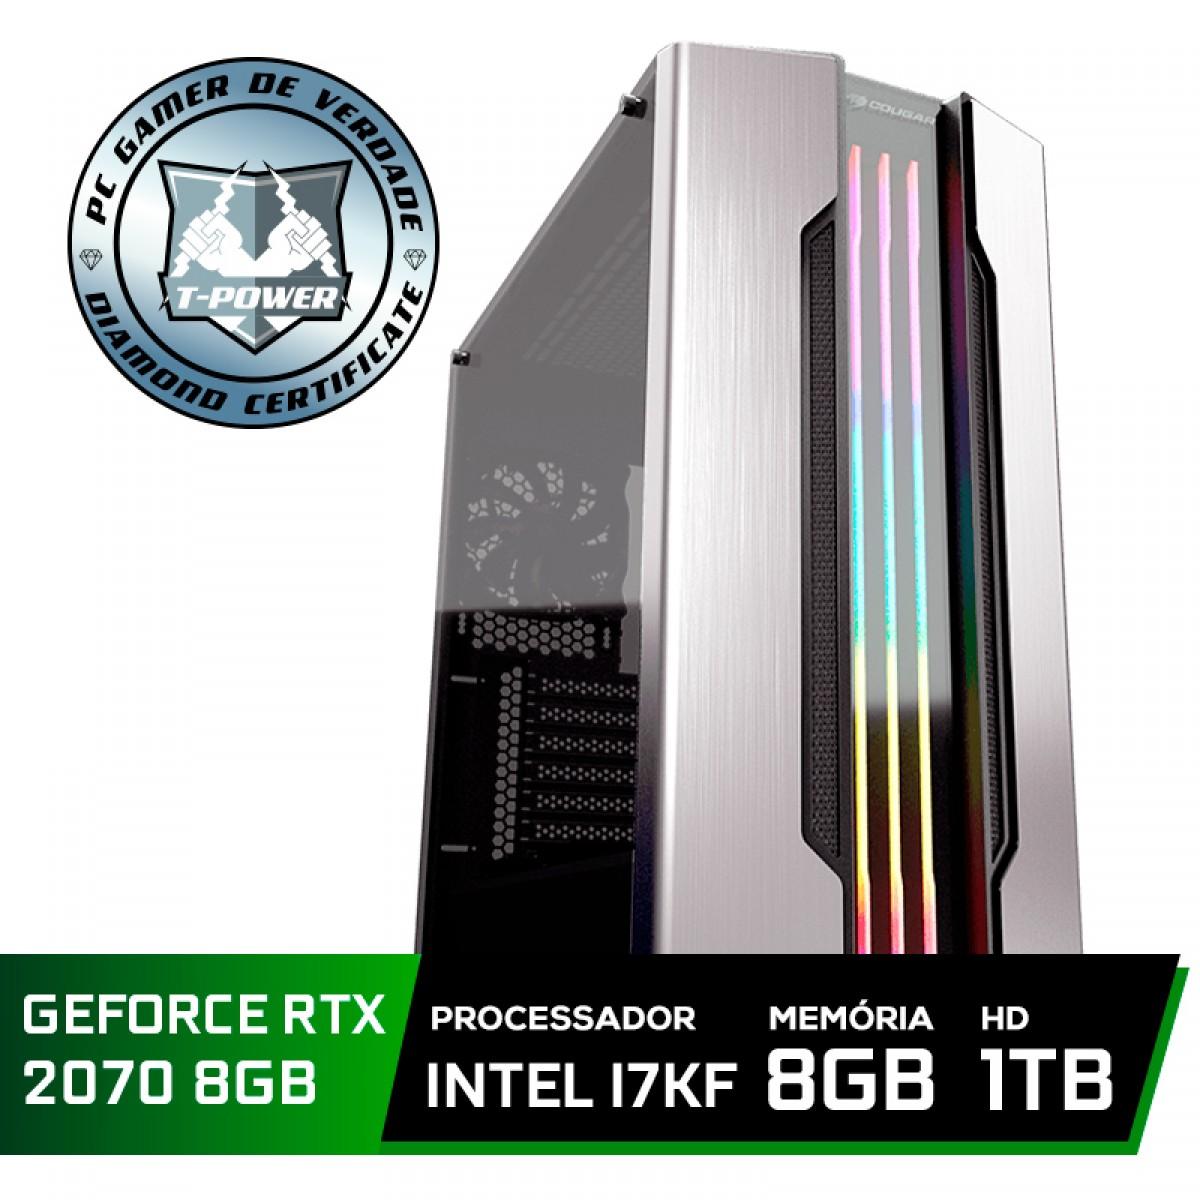 Pc Gamer Super Tera Edition Intel i7 9700KF / Geforce RTX 2070 / DDR4 8GB / HD 1TB / 600W